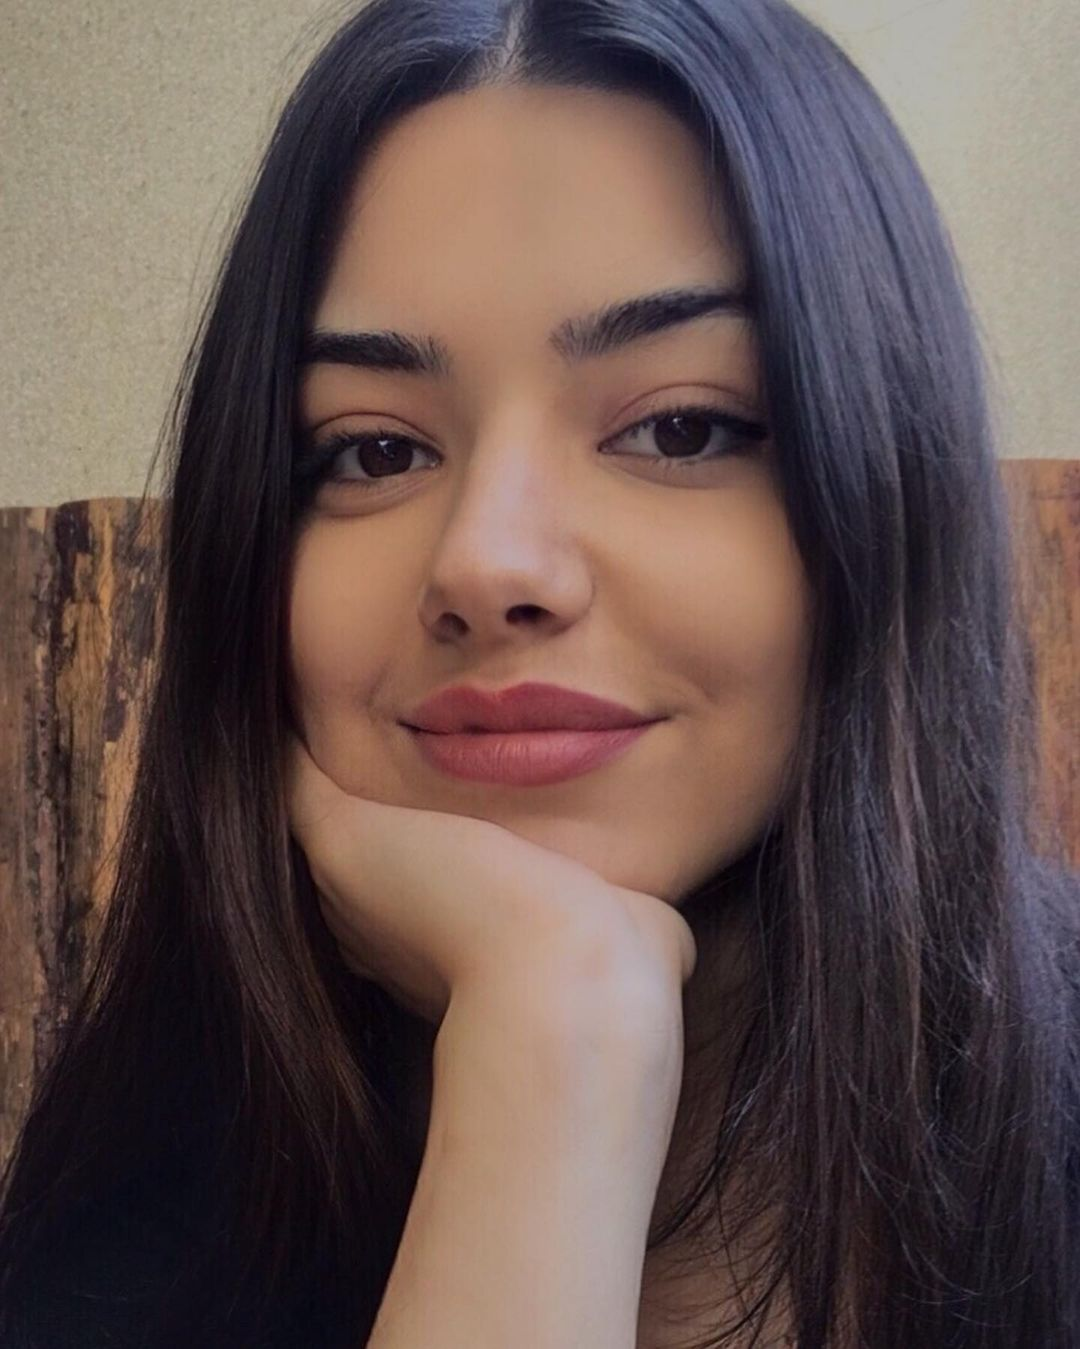 Melissa-Pinar-Wallpapers-Insta-Fit-Bio-11